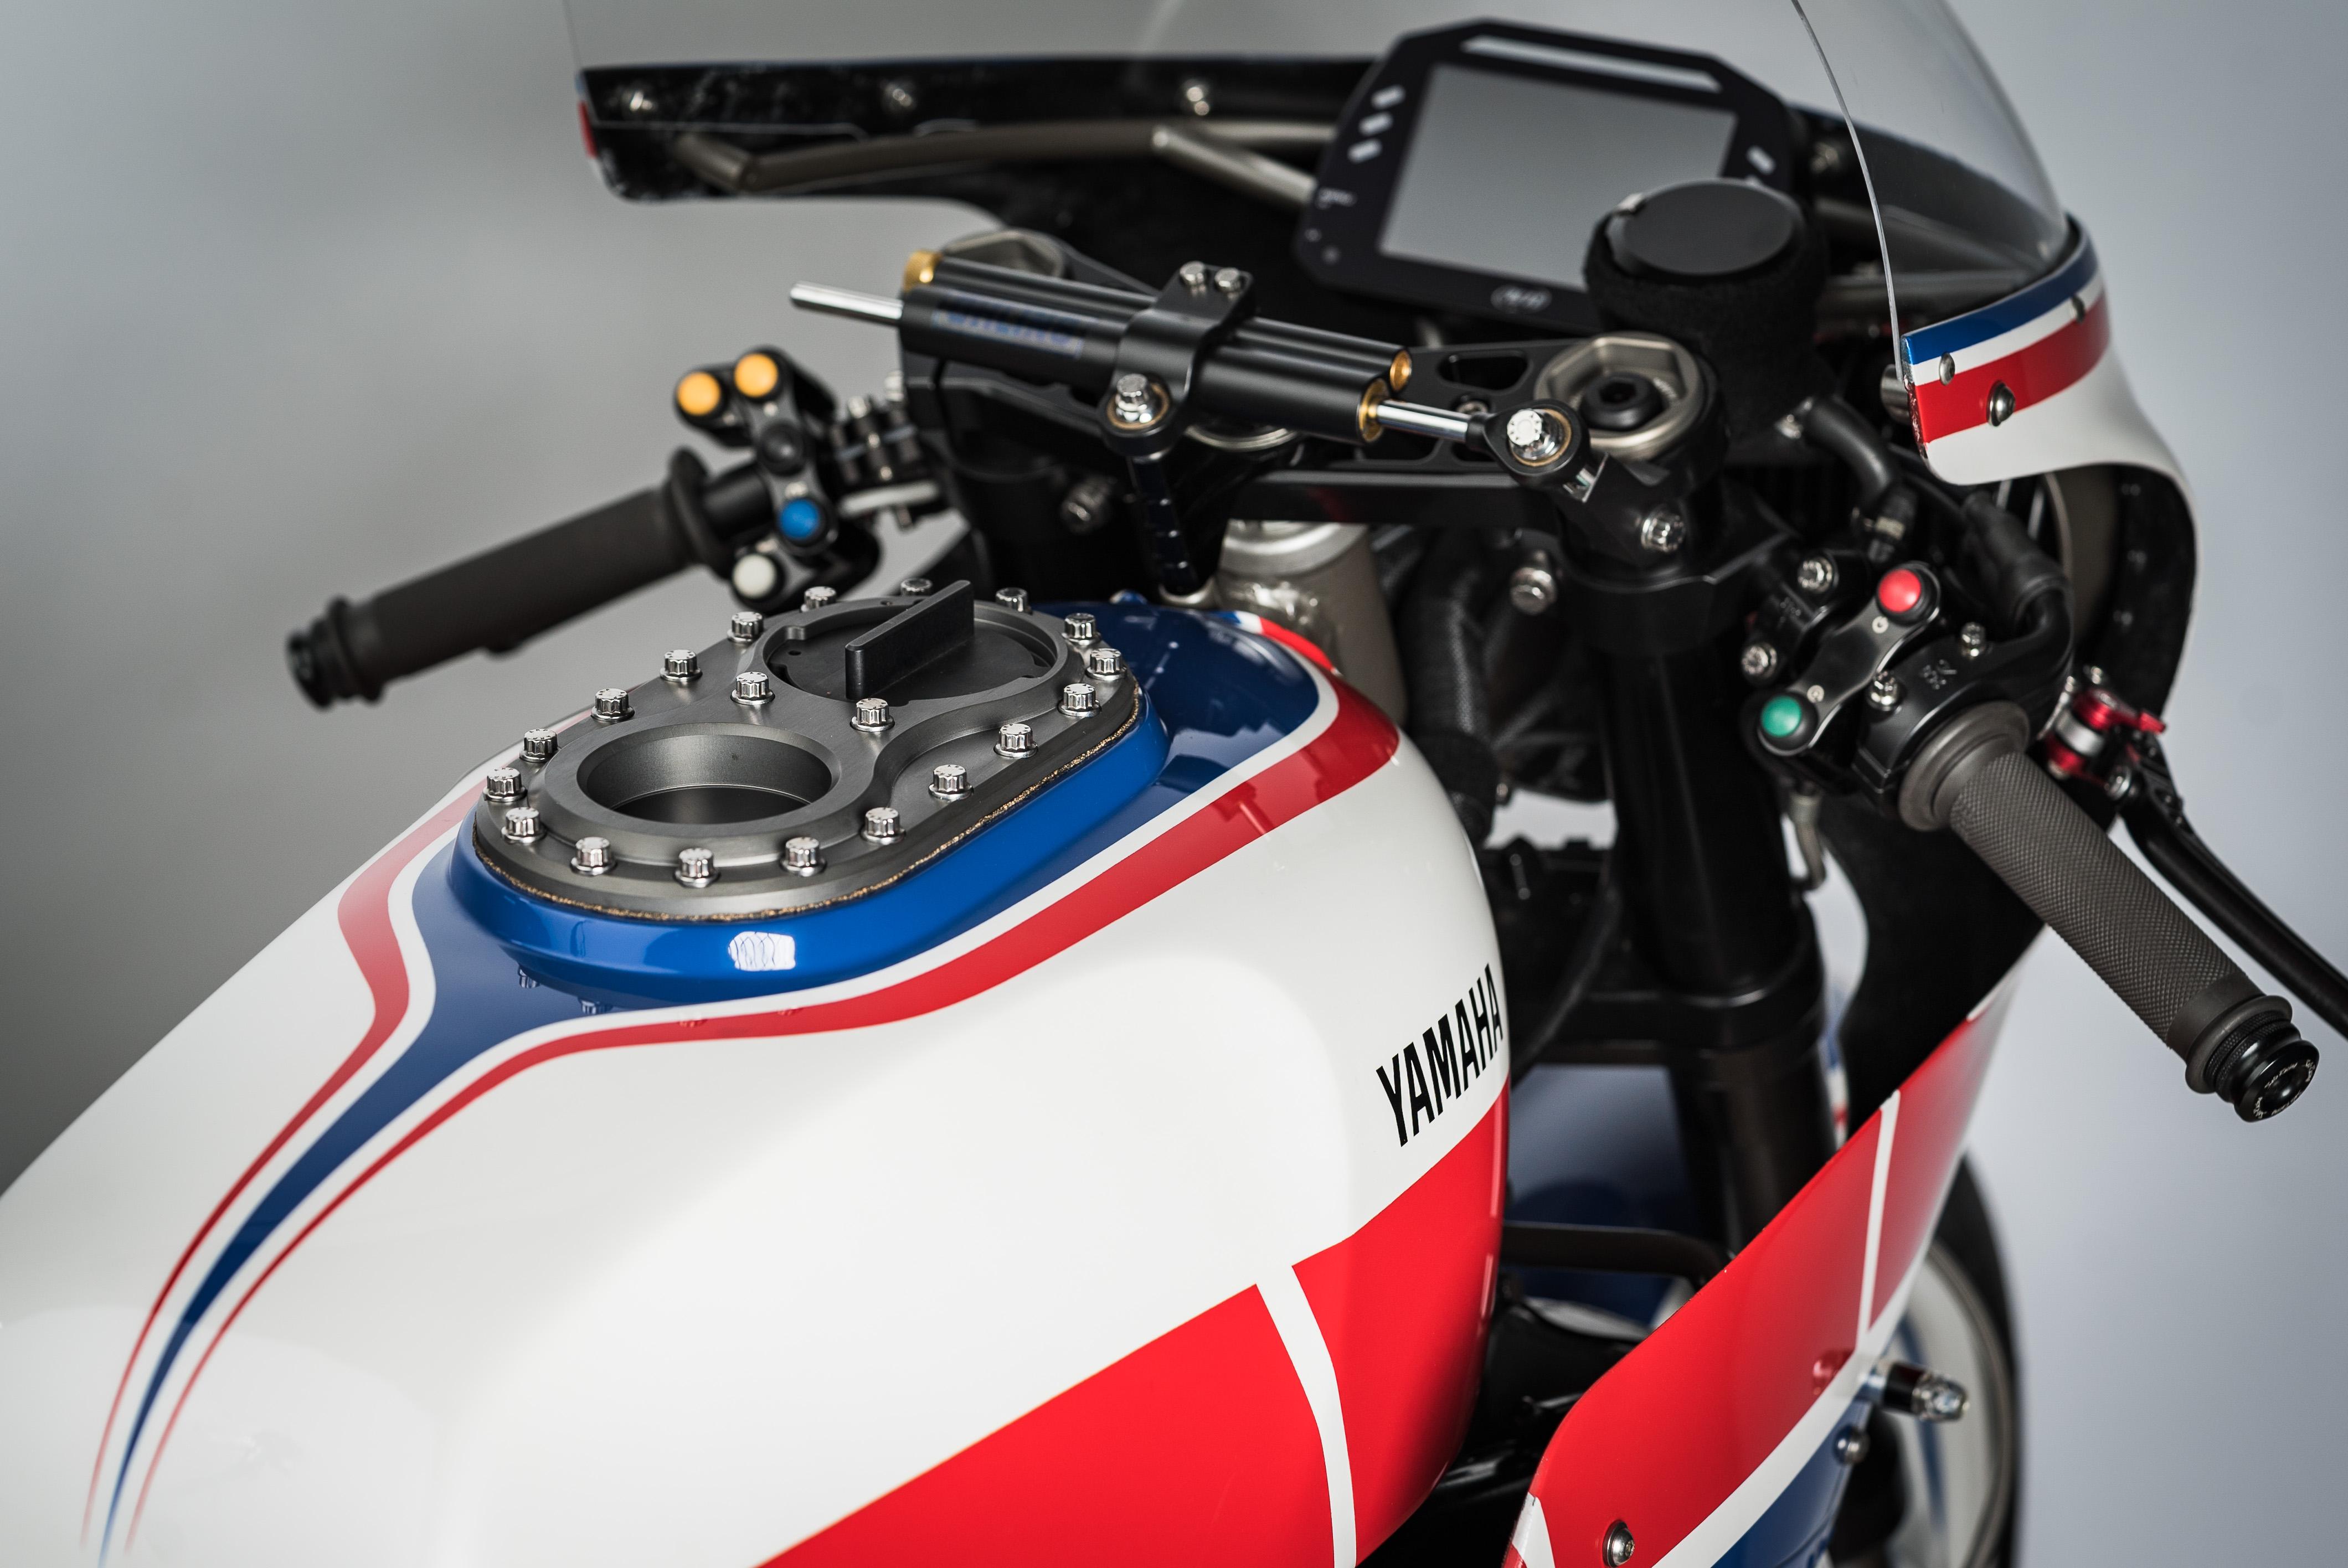 Turbo Maximus' :: a turbo-charged Yamaha XJ750 Maxim - The Bullitt